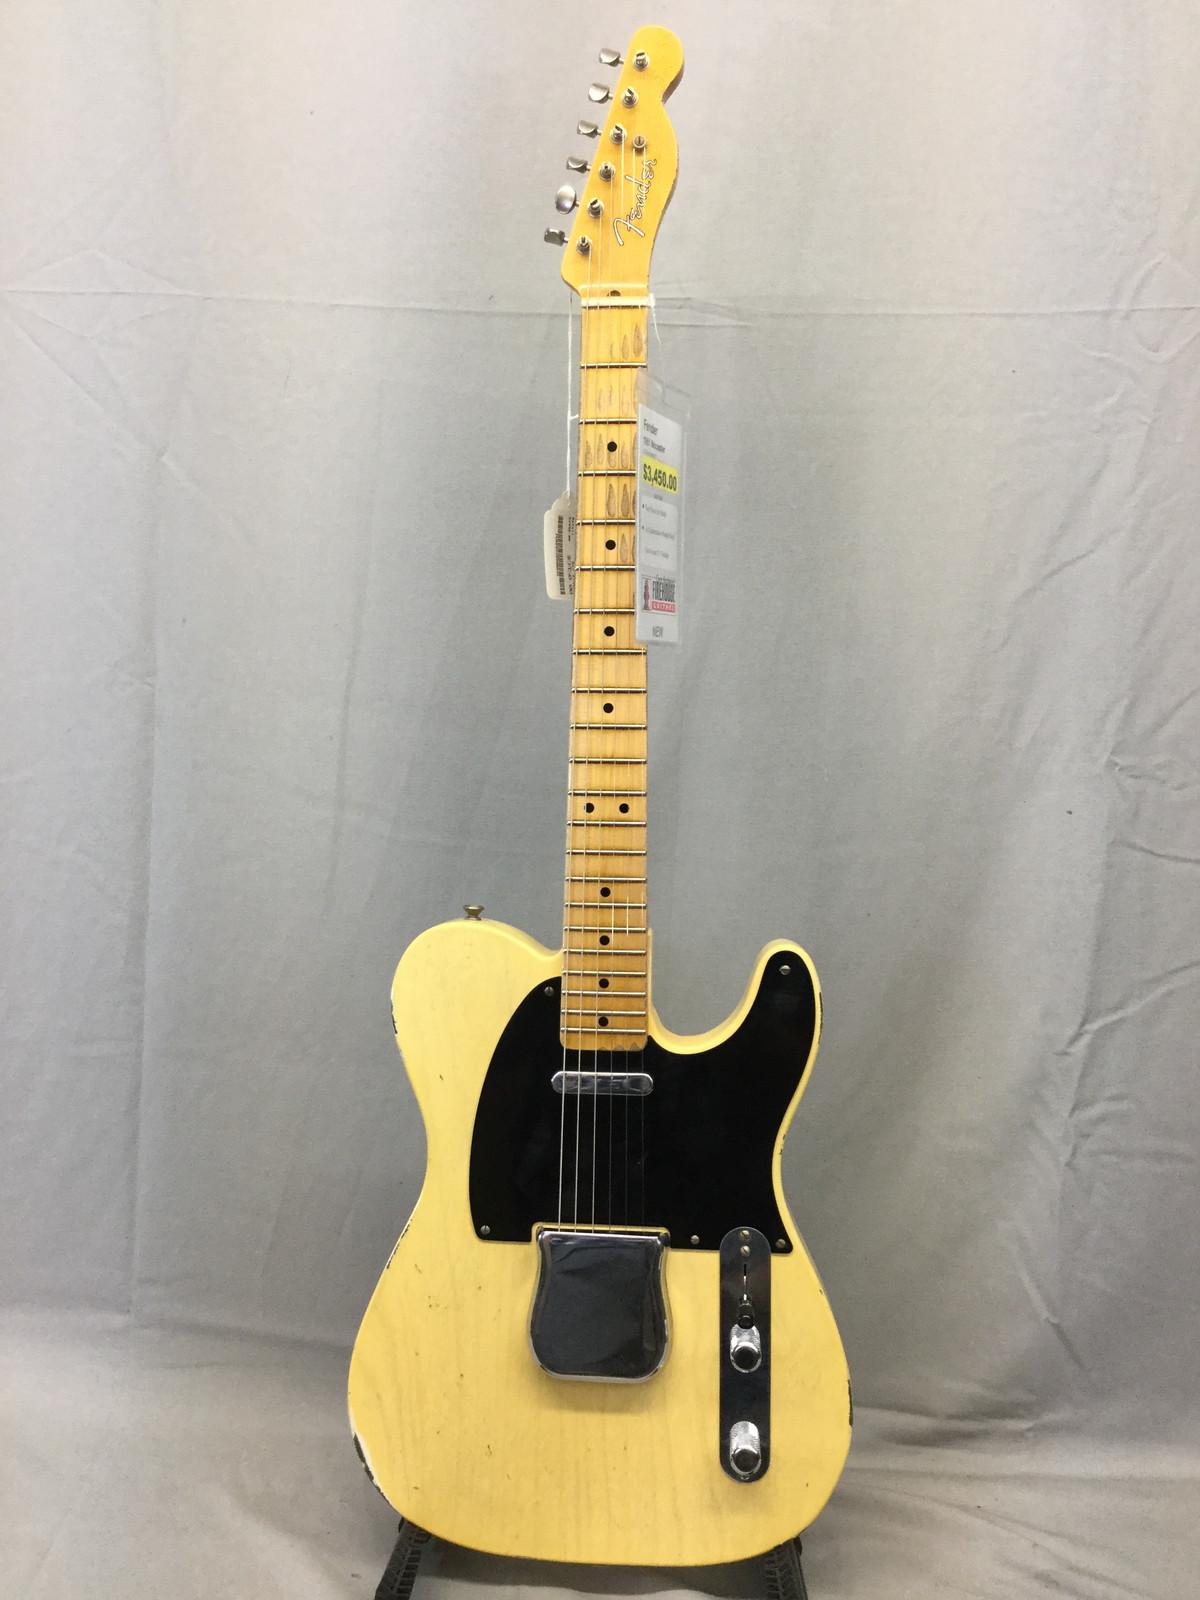 Fender Custom Shop 1951 Nocaster Custom Built Faded Tele $3450